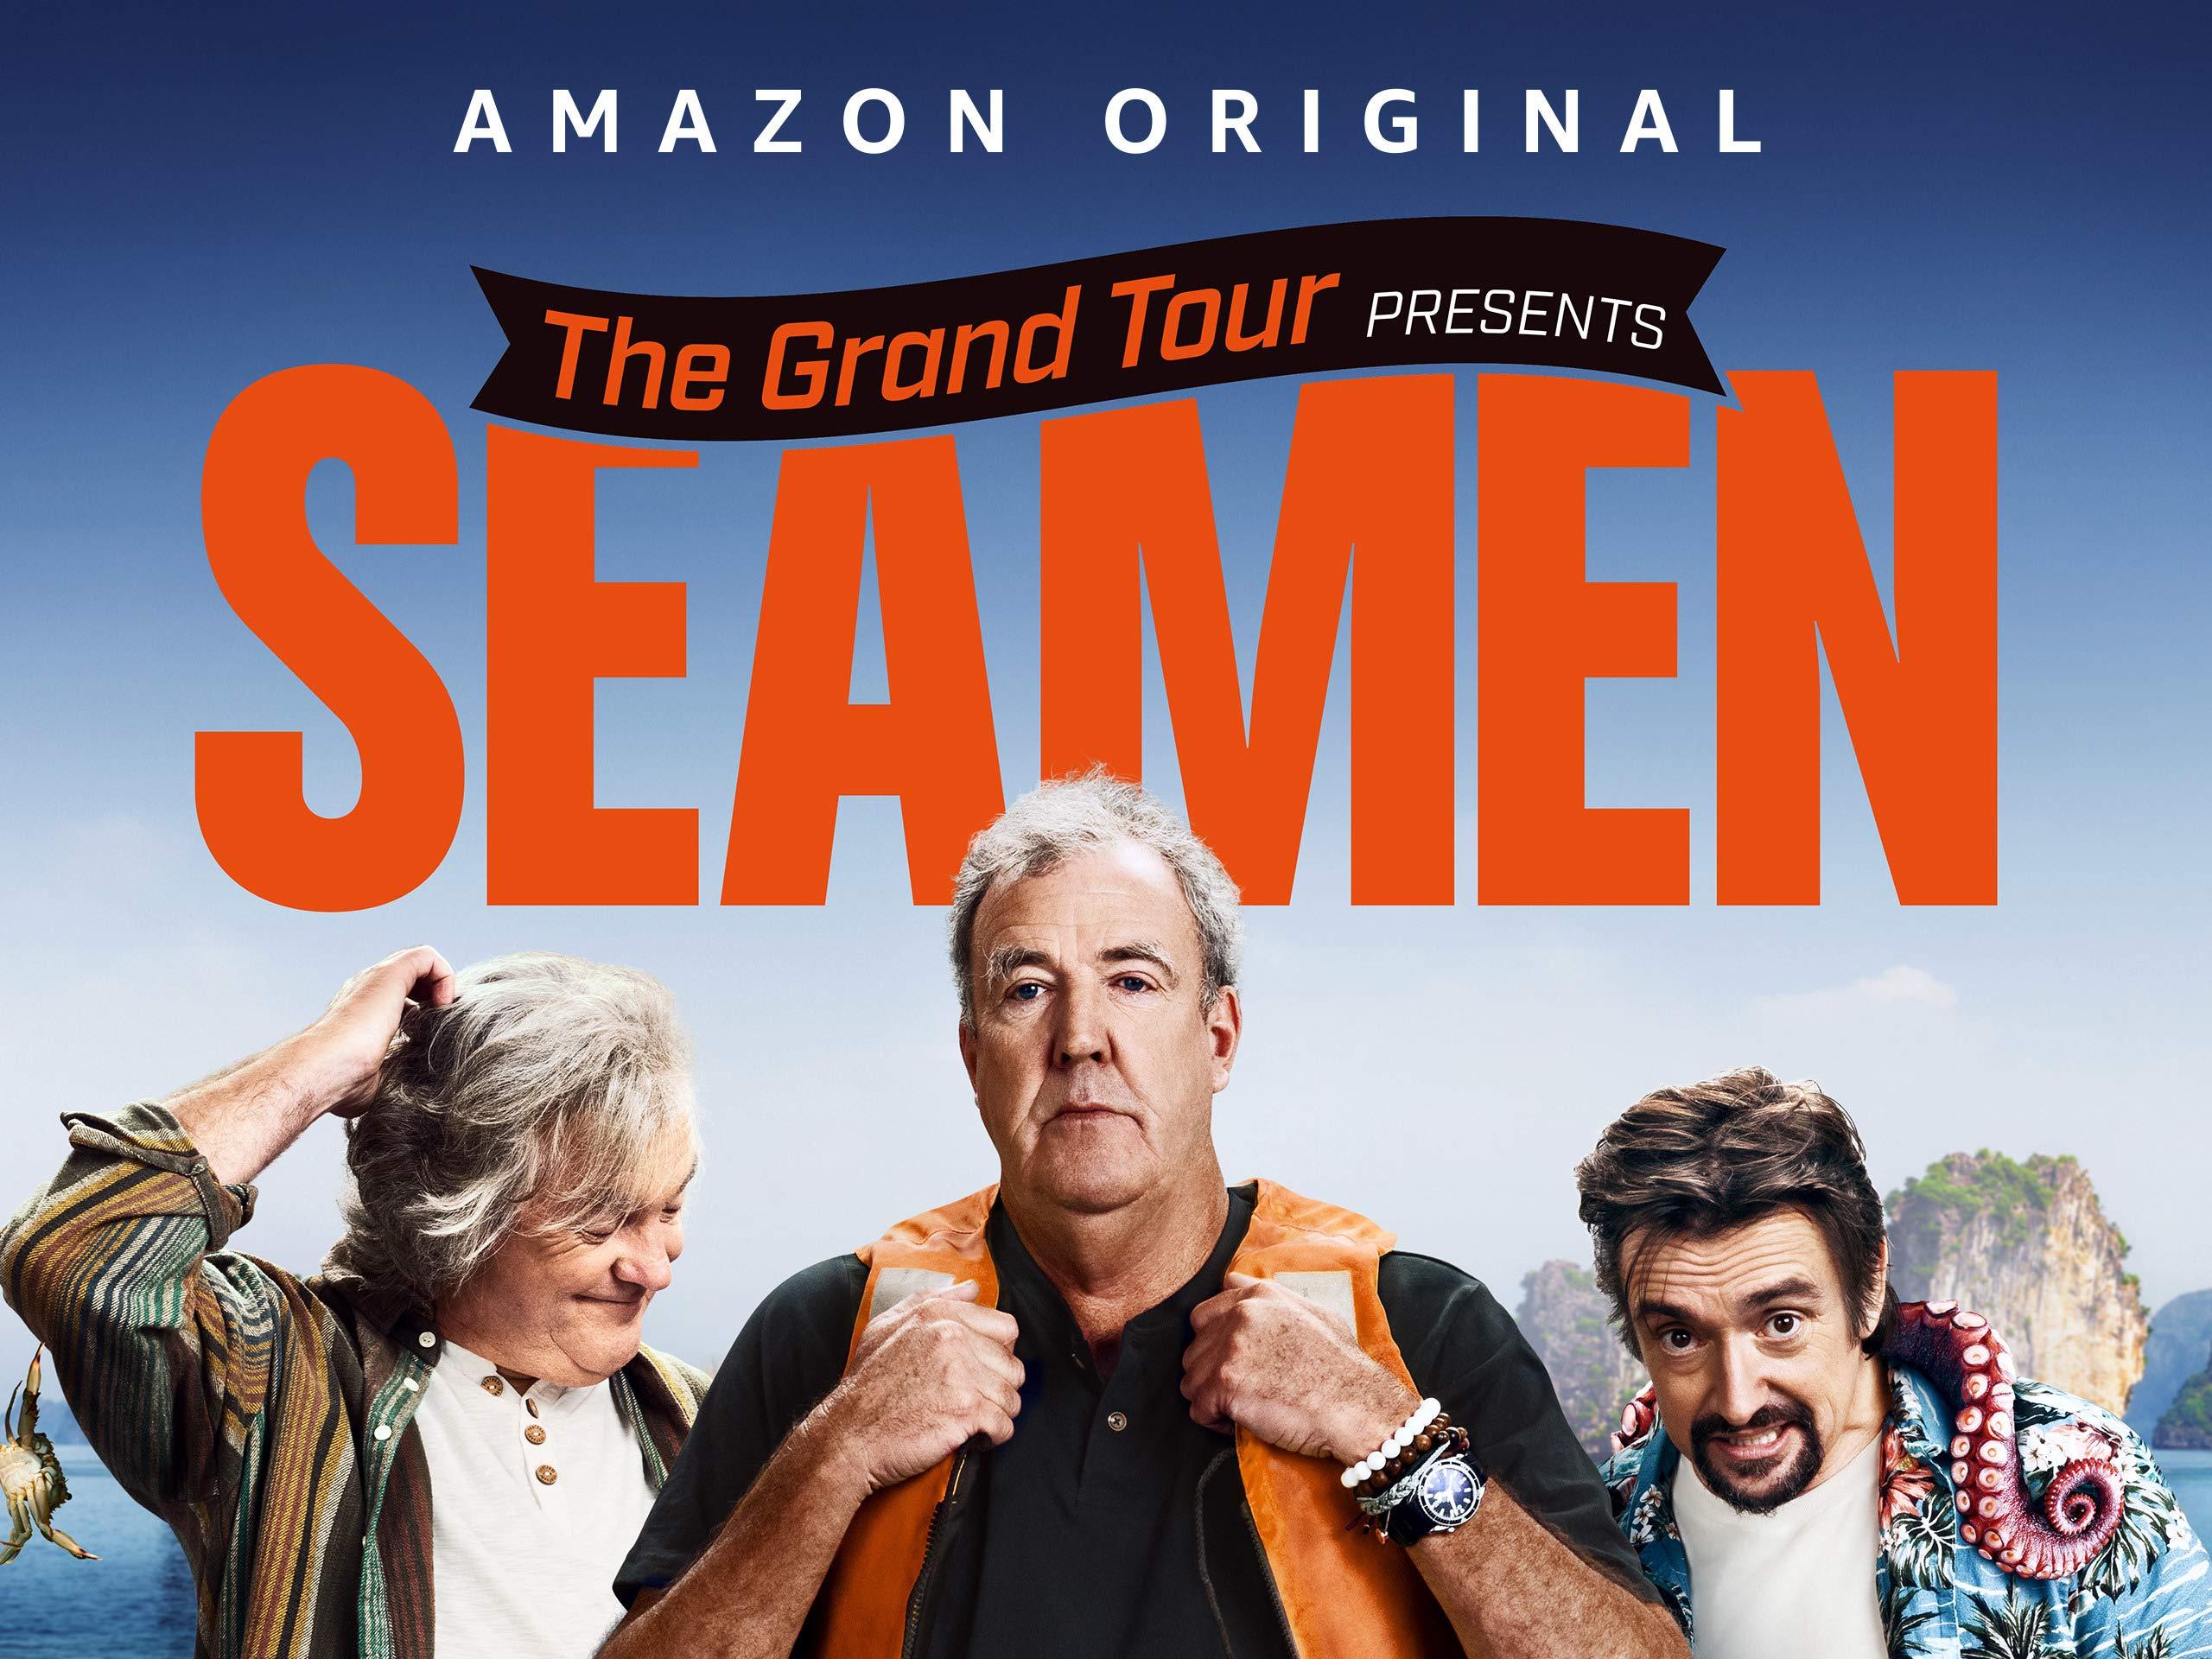 The Grand Tour (4K UHD)